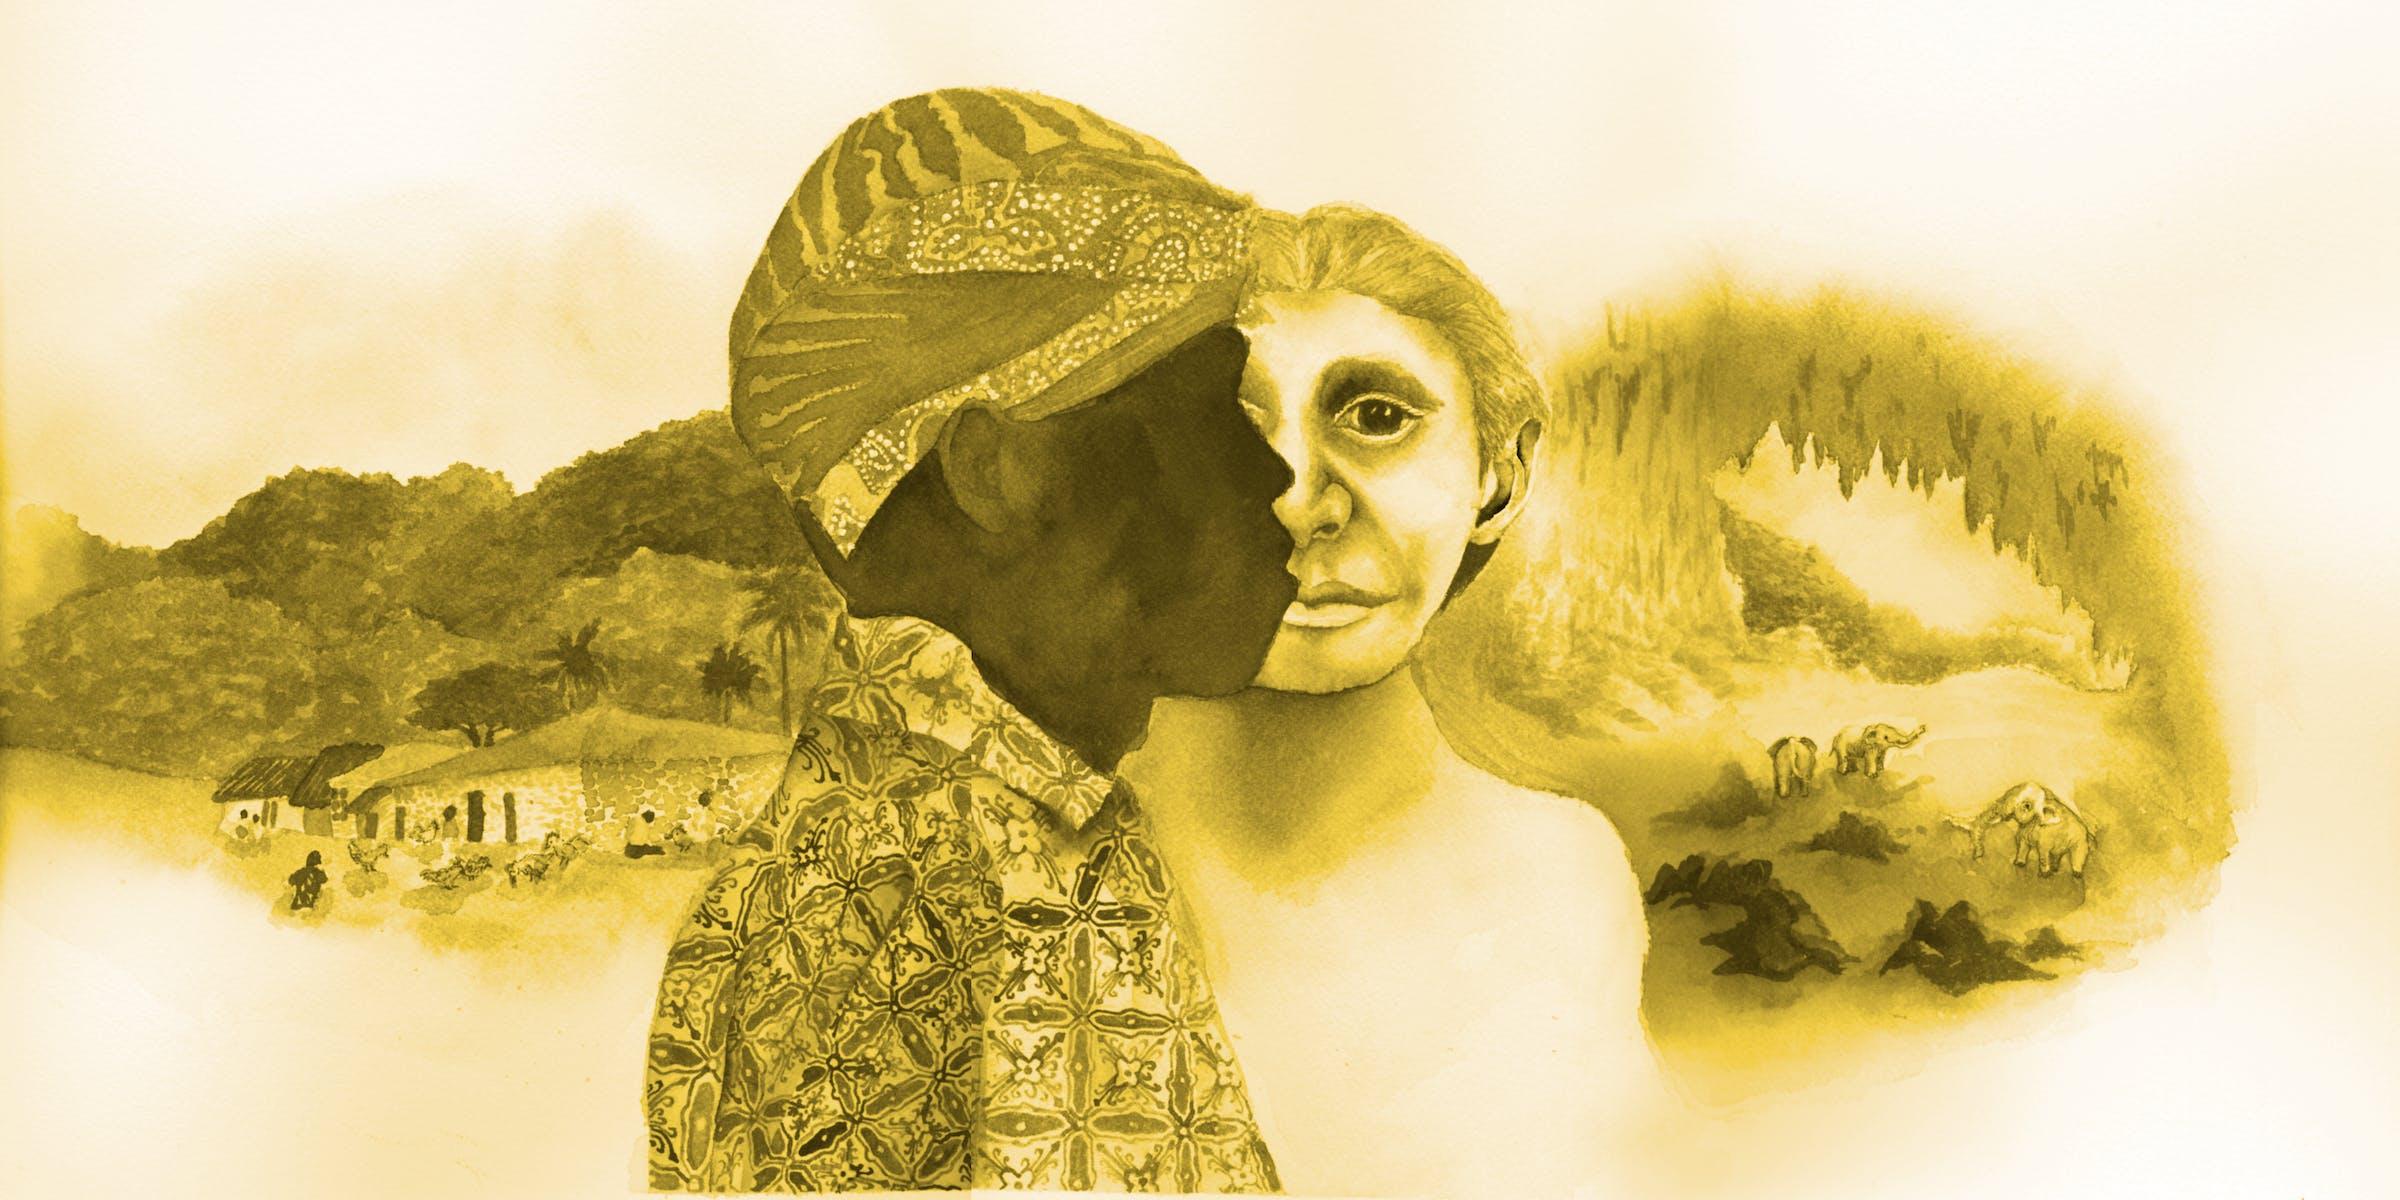 H. floresiensis